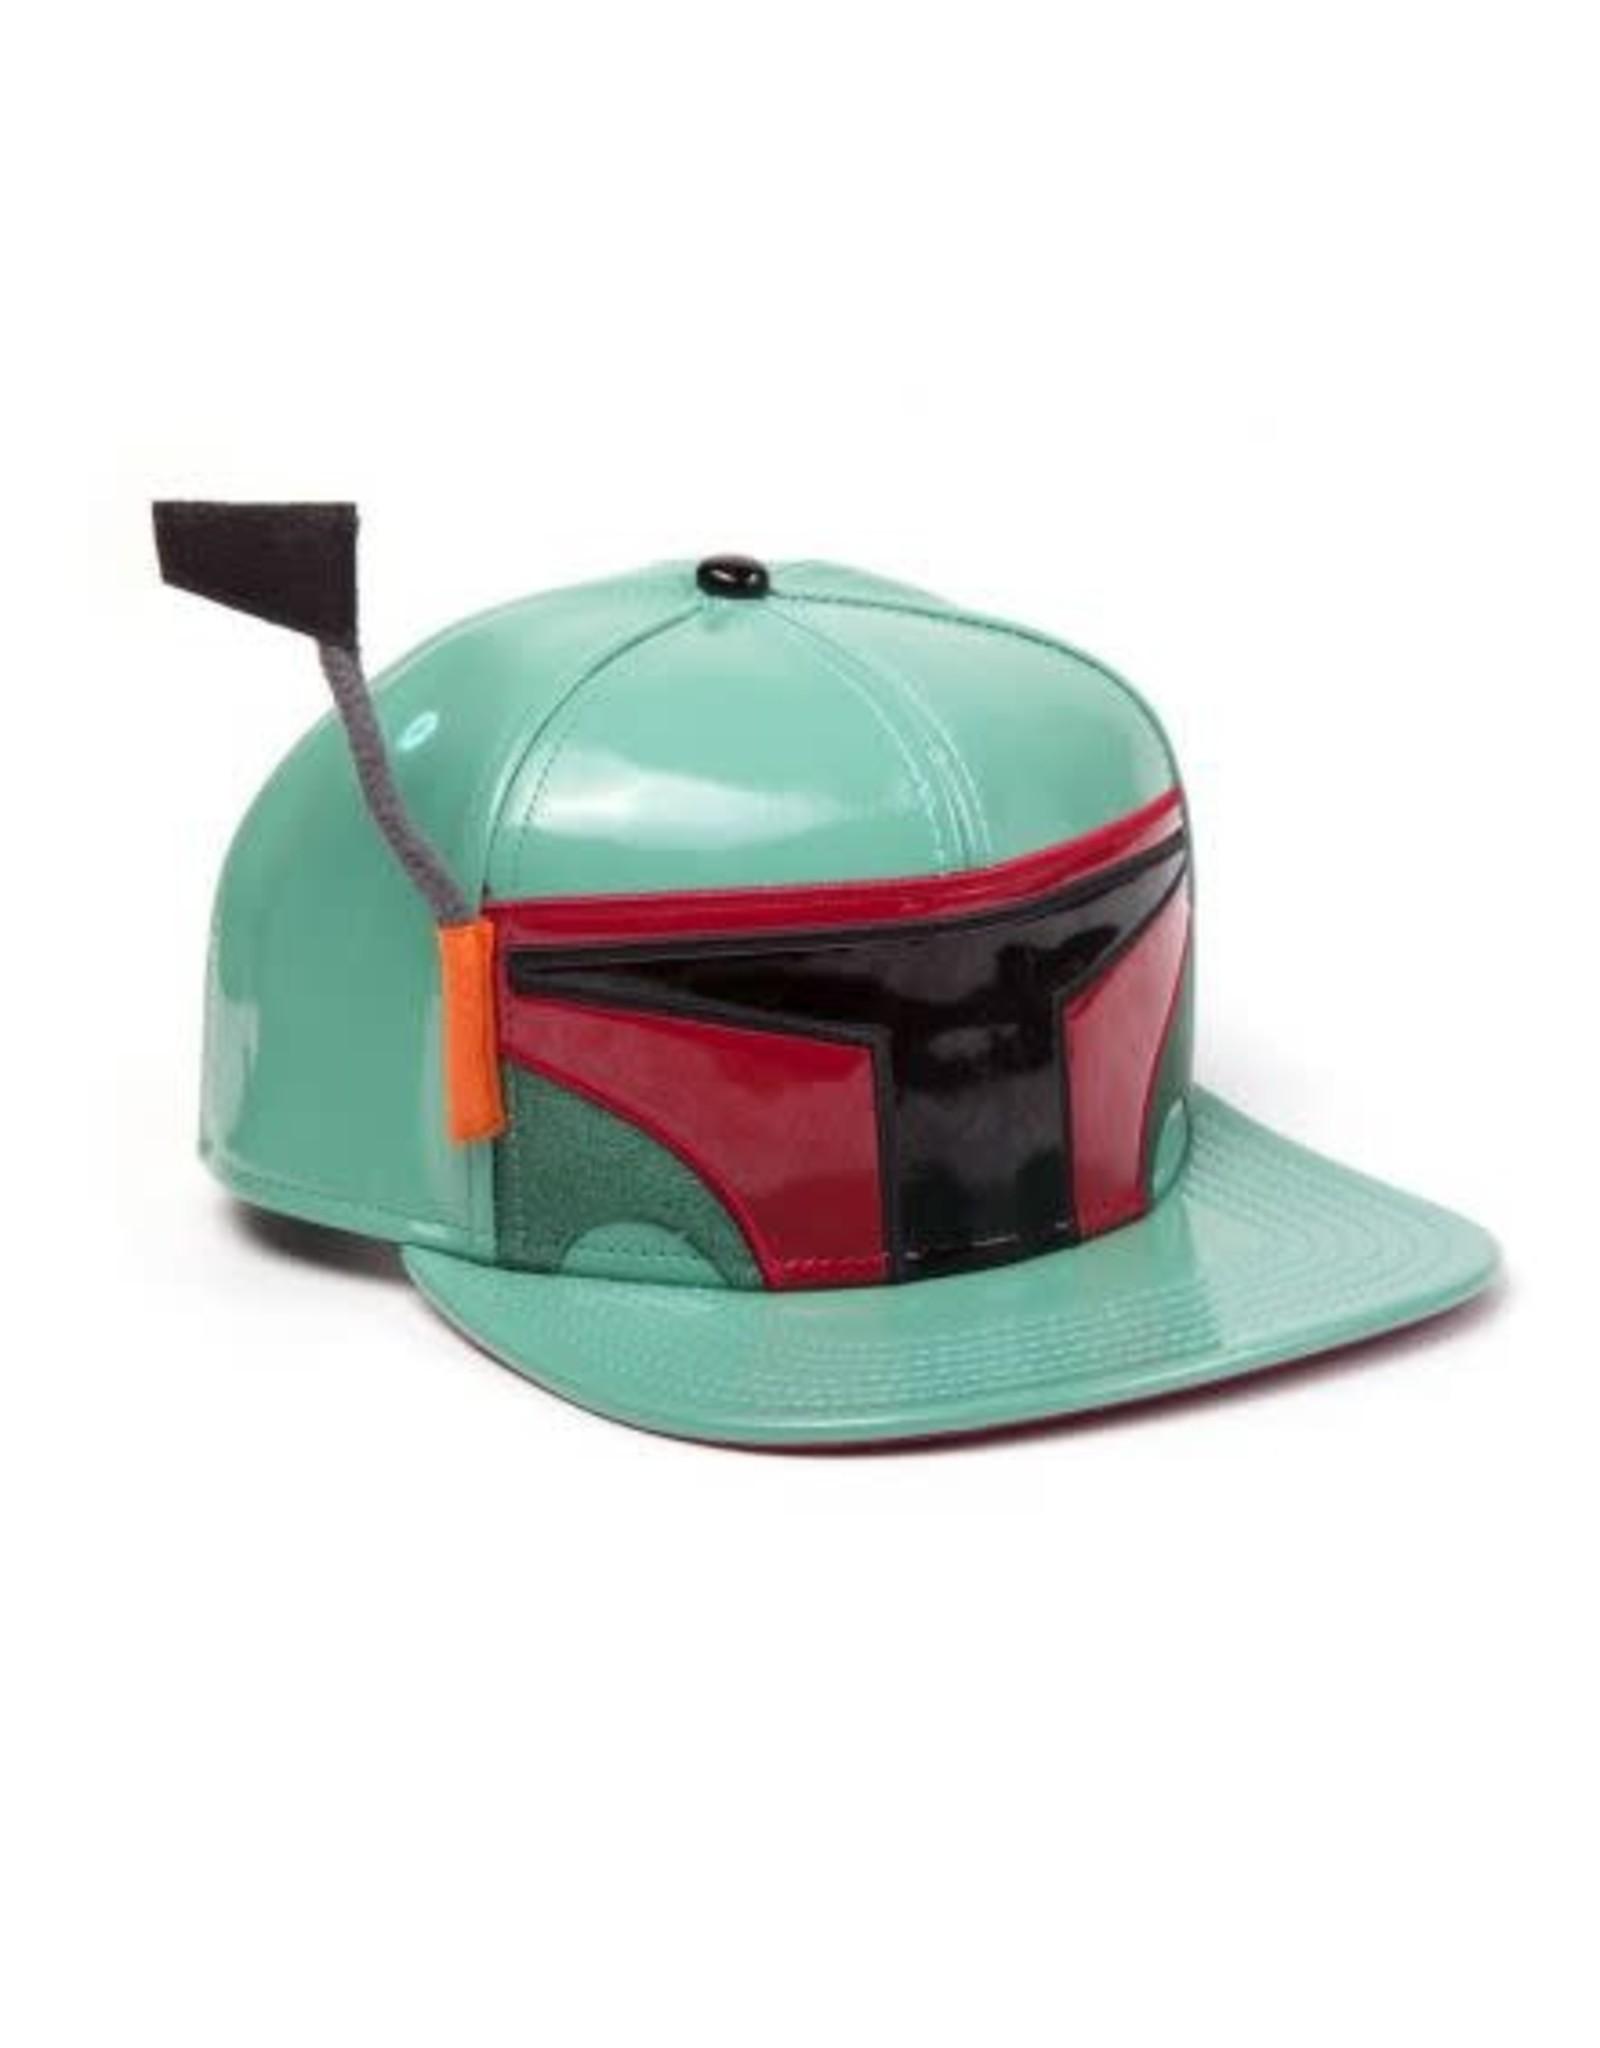 STAR WARS Premium Cap - Boba Fett With Antenna